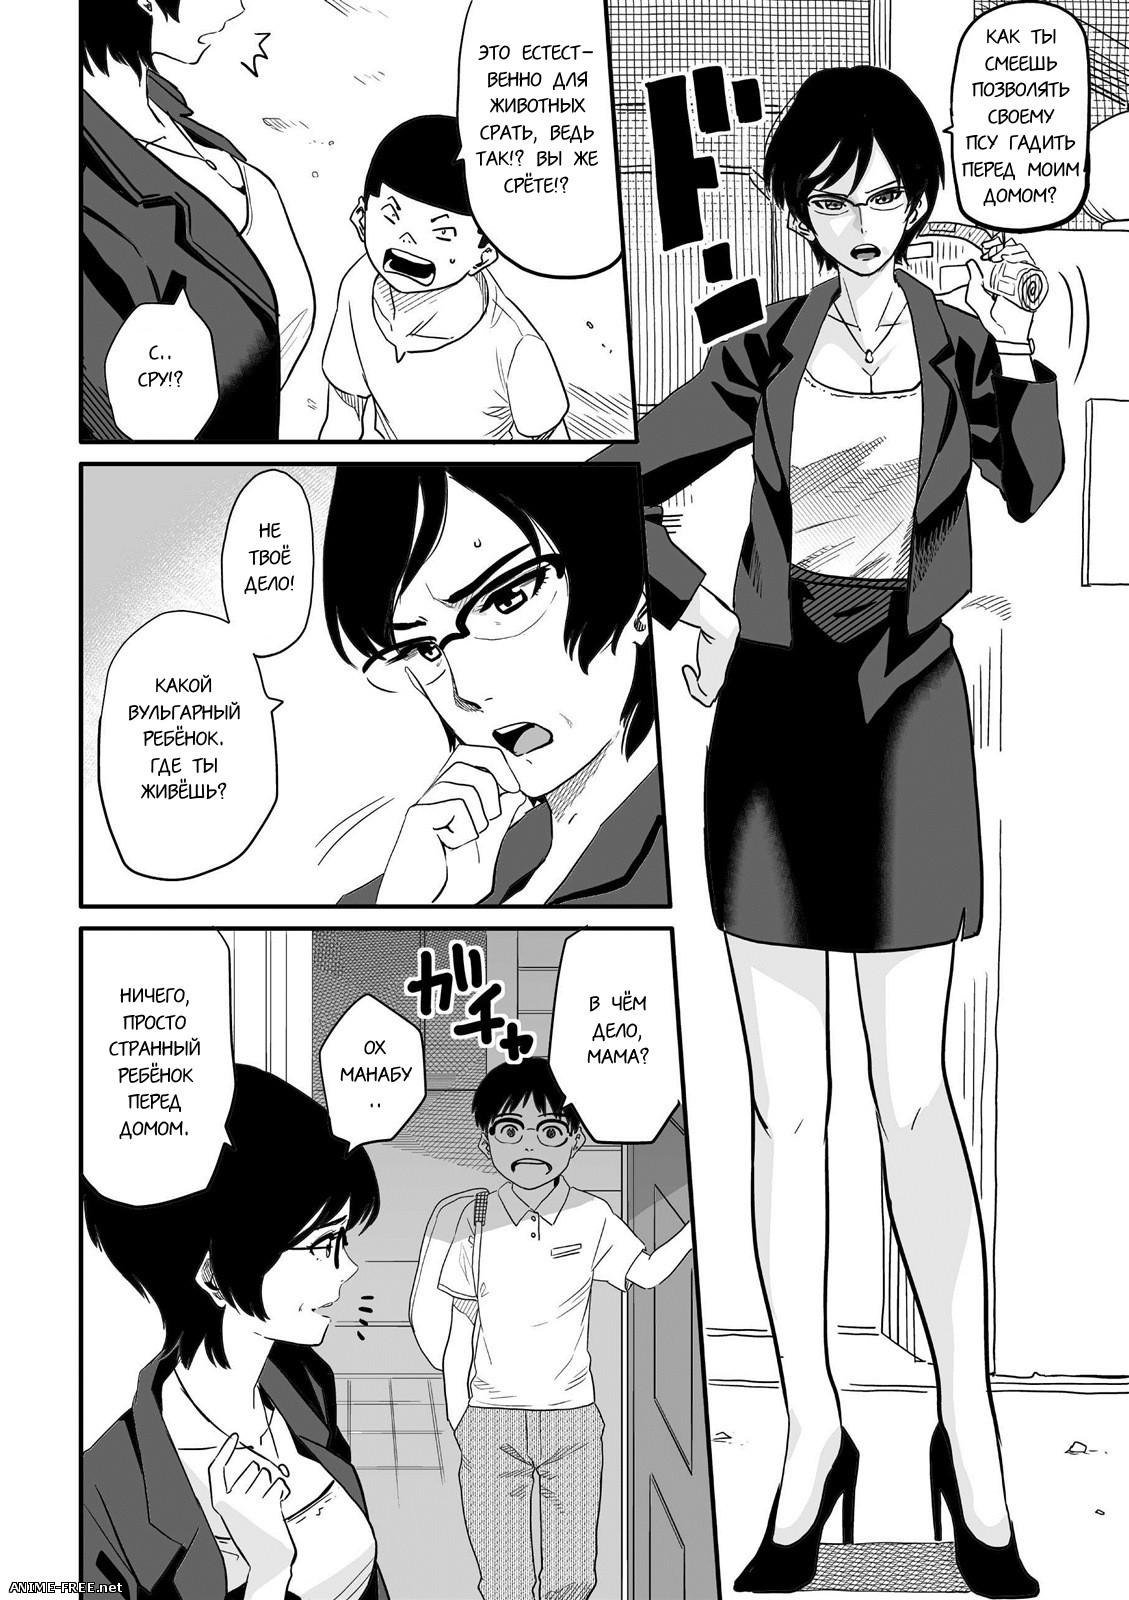 Hook / Captain Hana Hook - Сборник хентай манги [Ptcen] [ENG,RUS,JAP] Manga Hentai